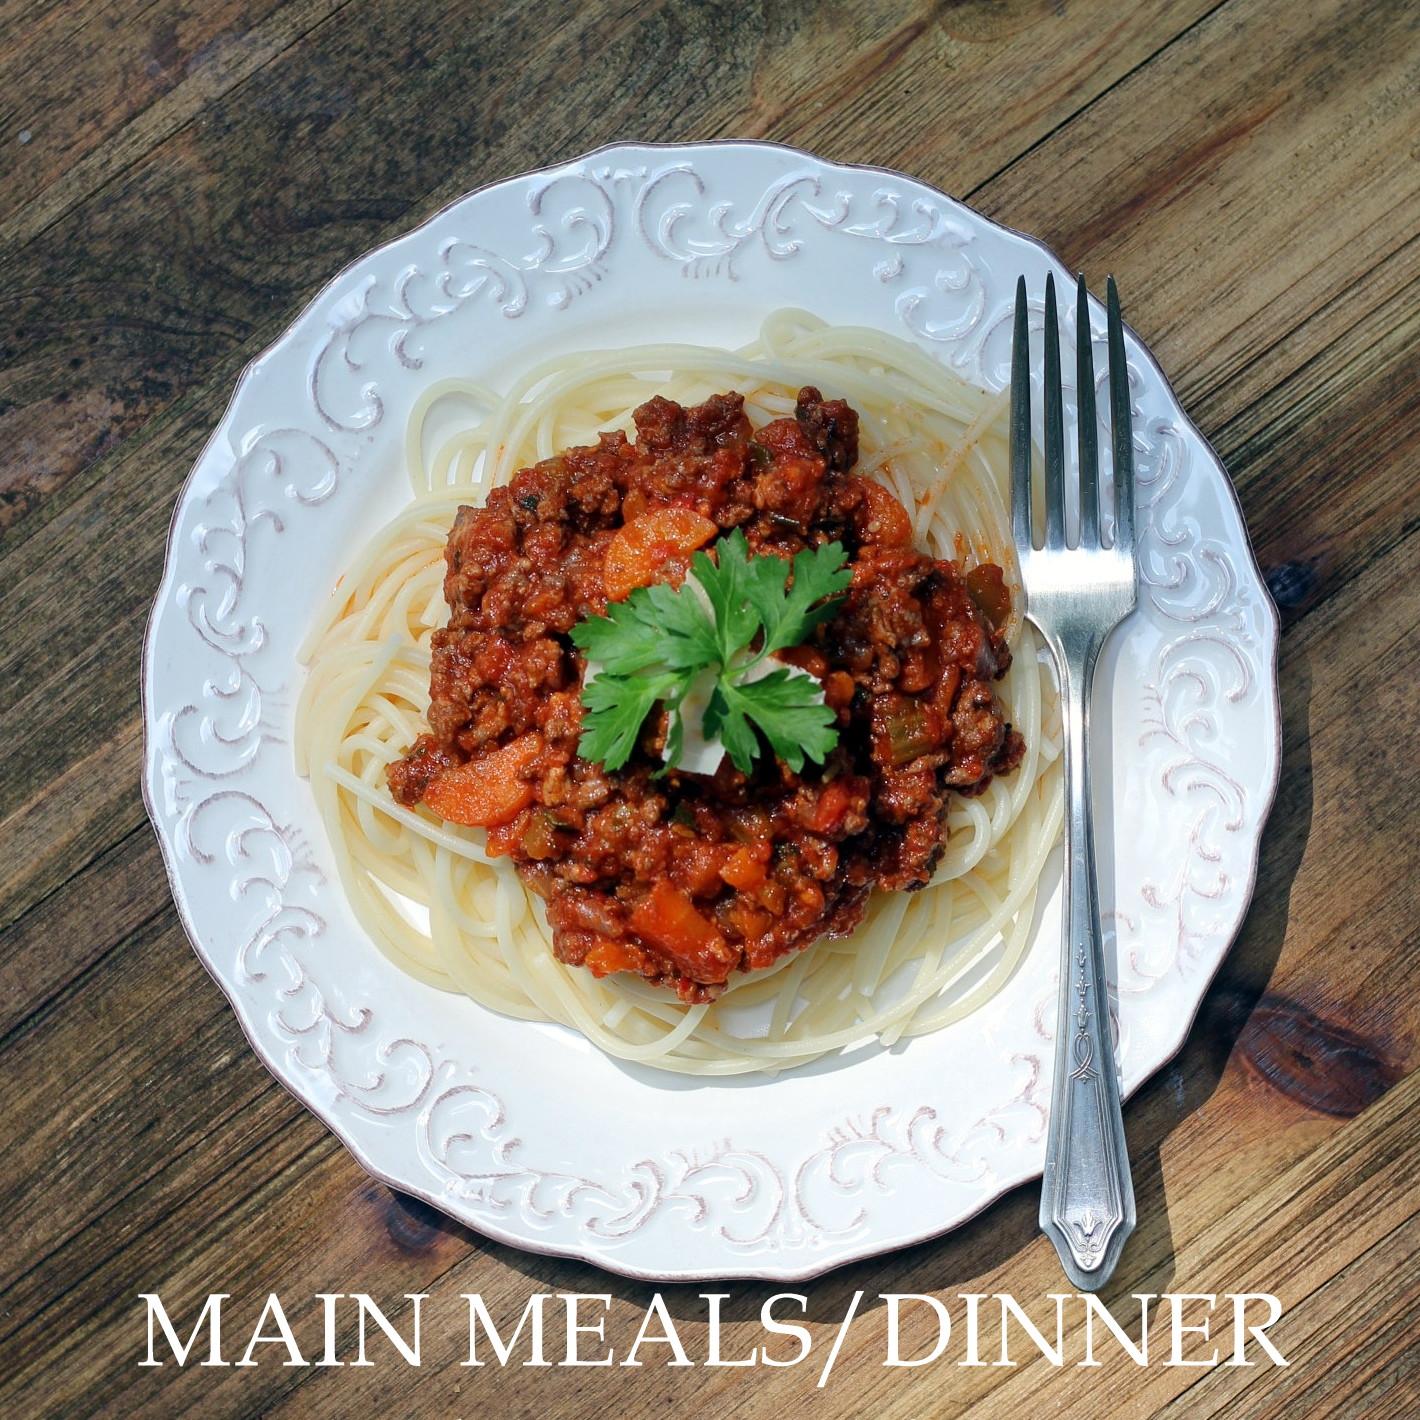 MAIN MEALS/DINNER